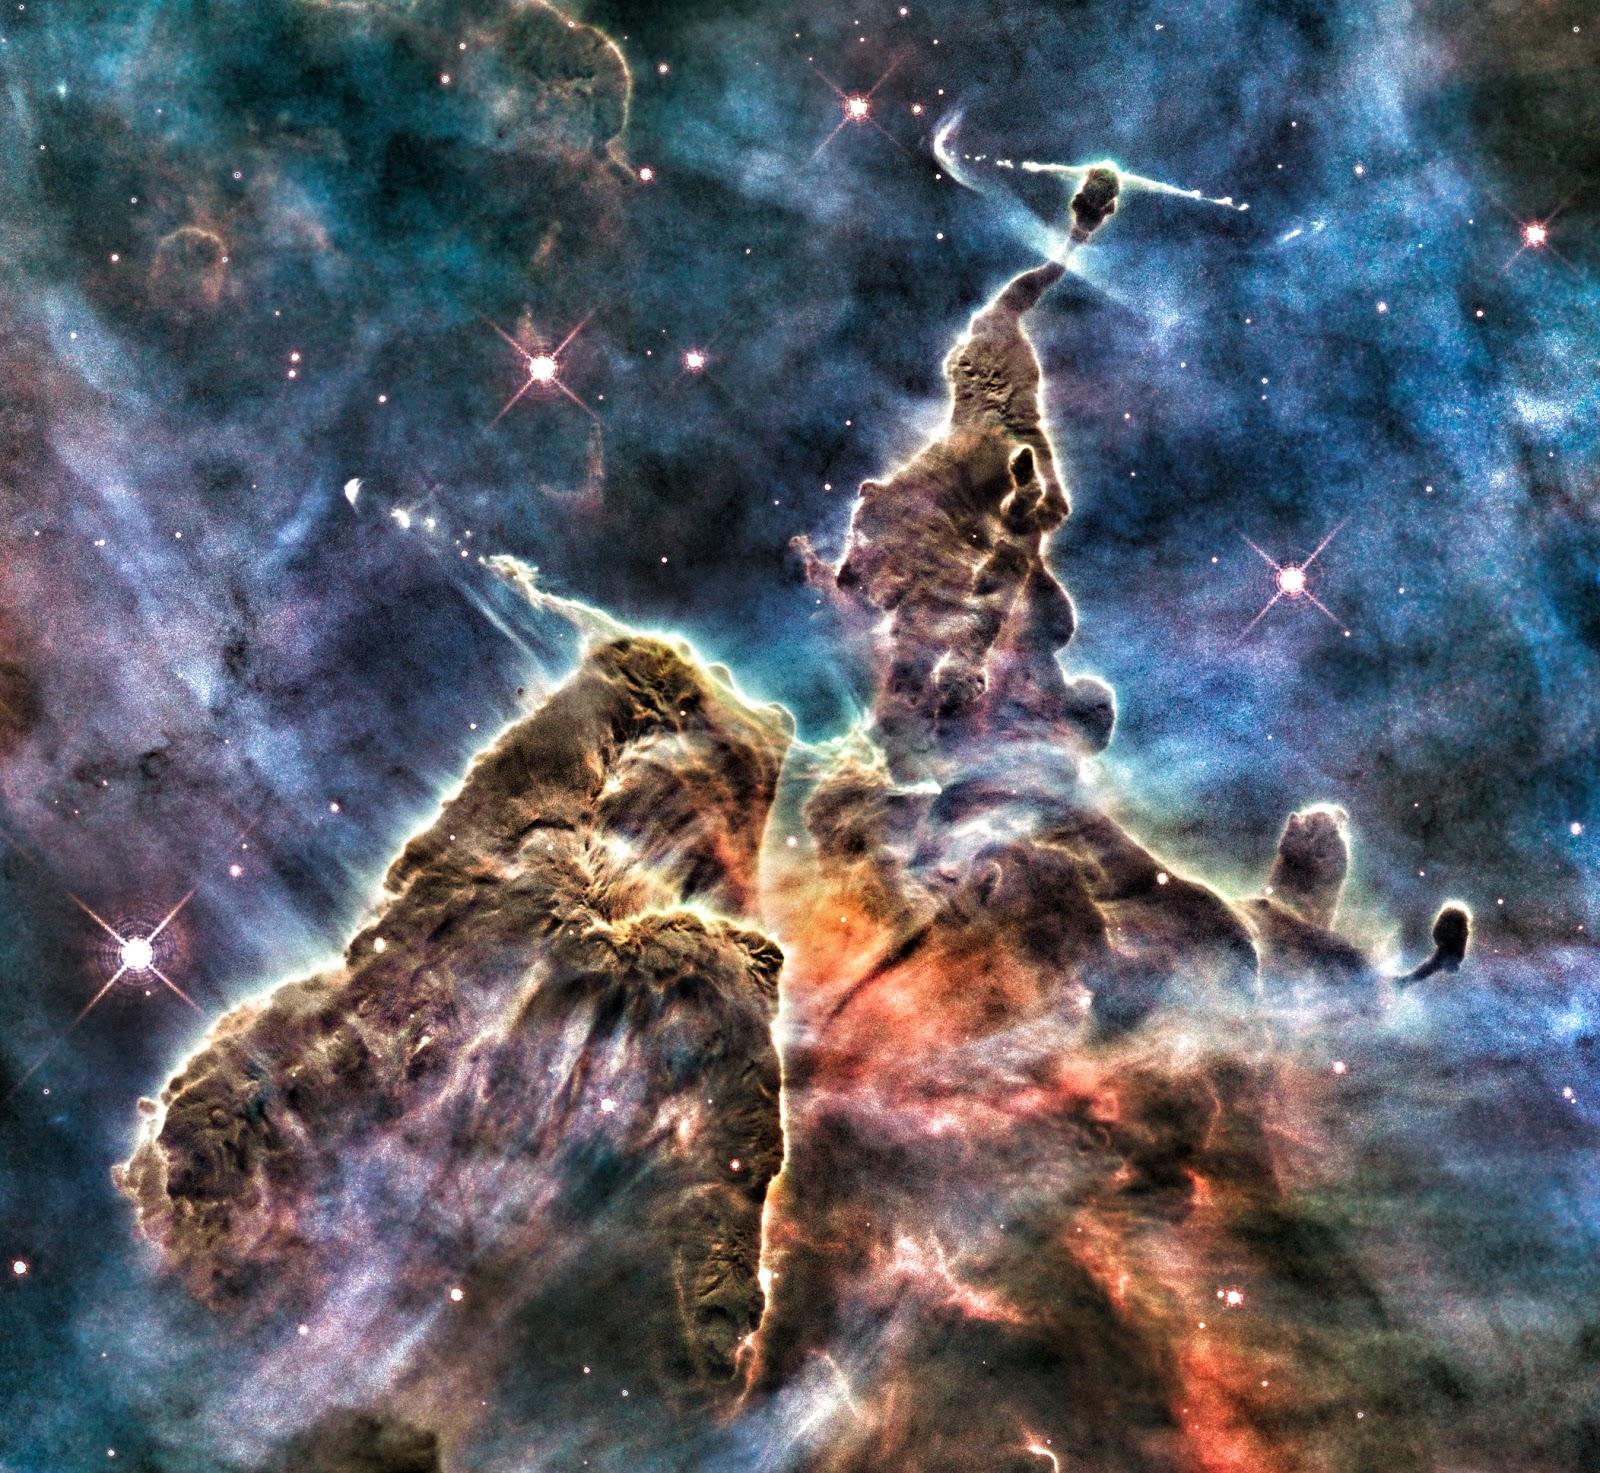 Mystic Mountain (region in the Carina Nebula) | Earth Blog